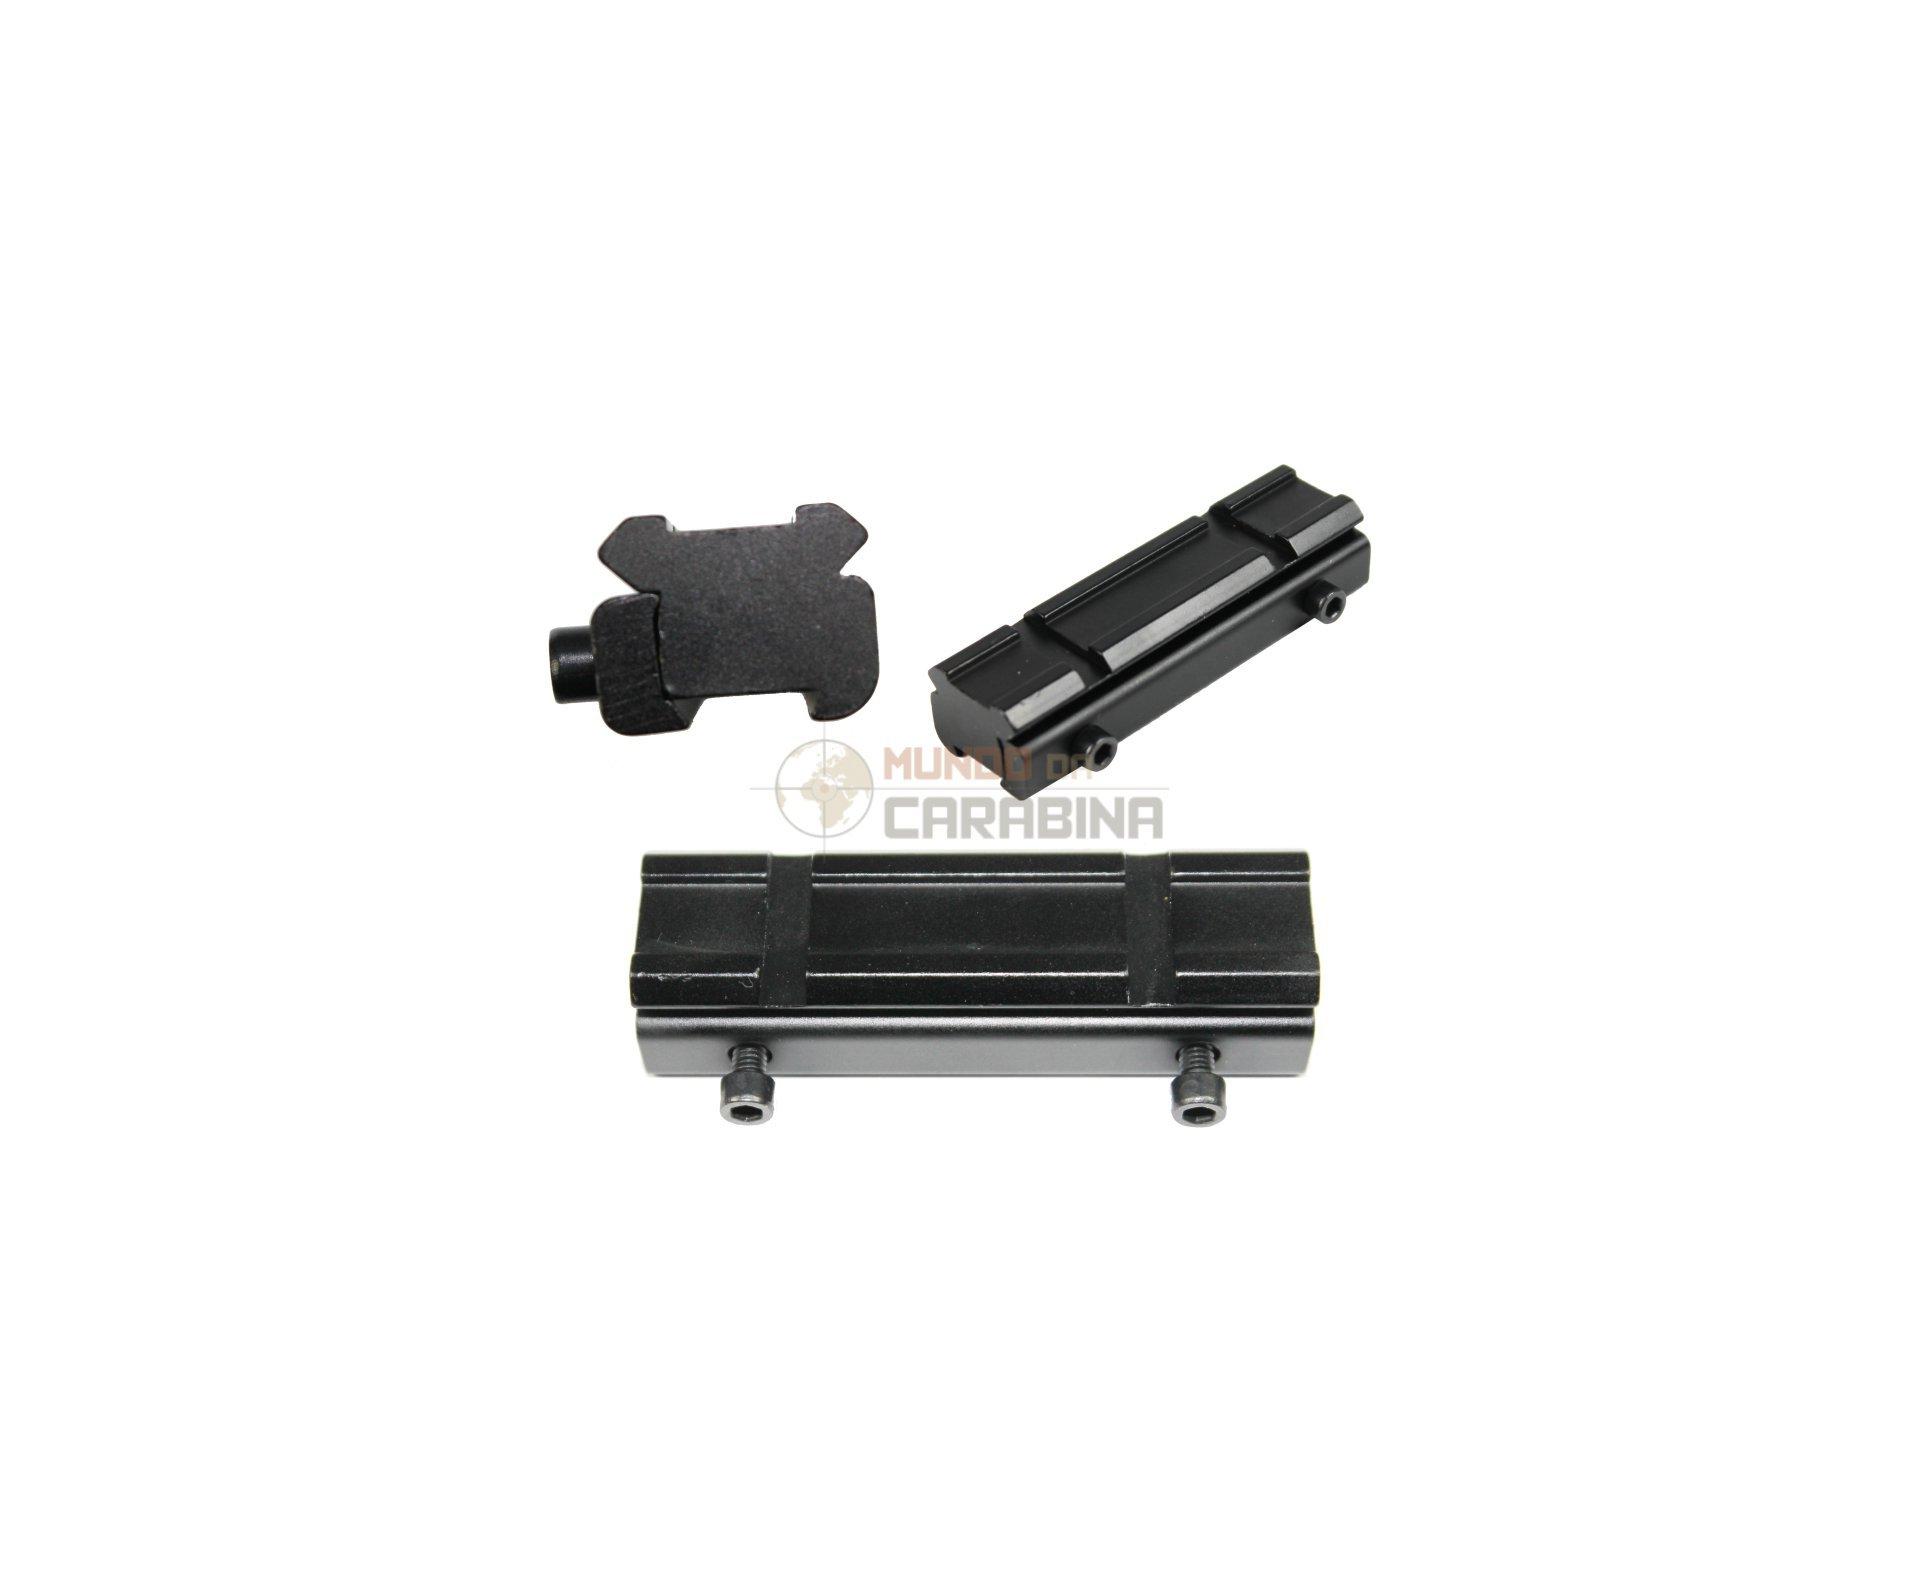 Suporte Adaptador Trilho 11mm/22mm Rossi